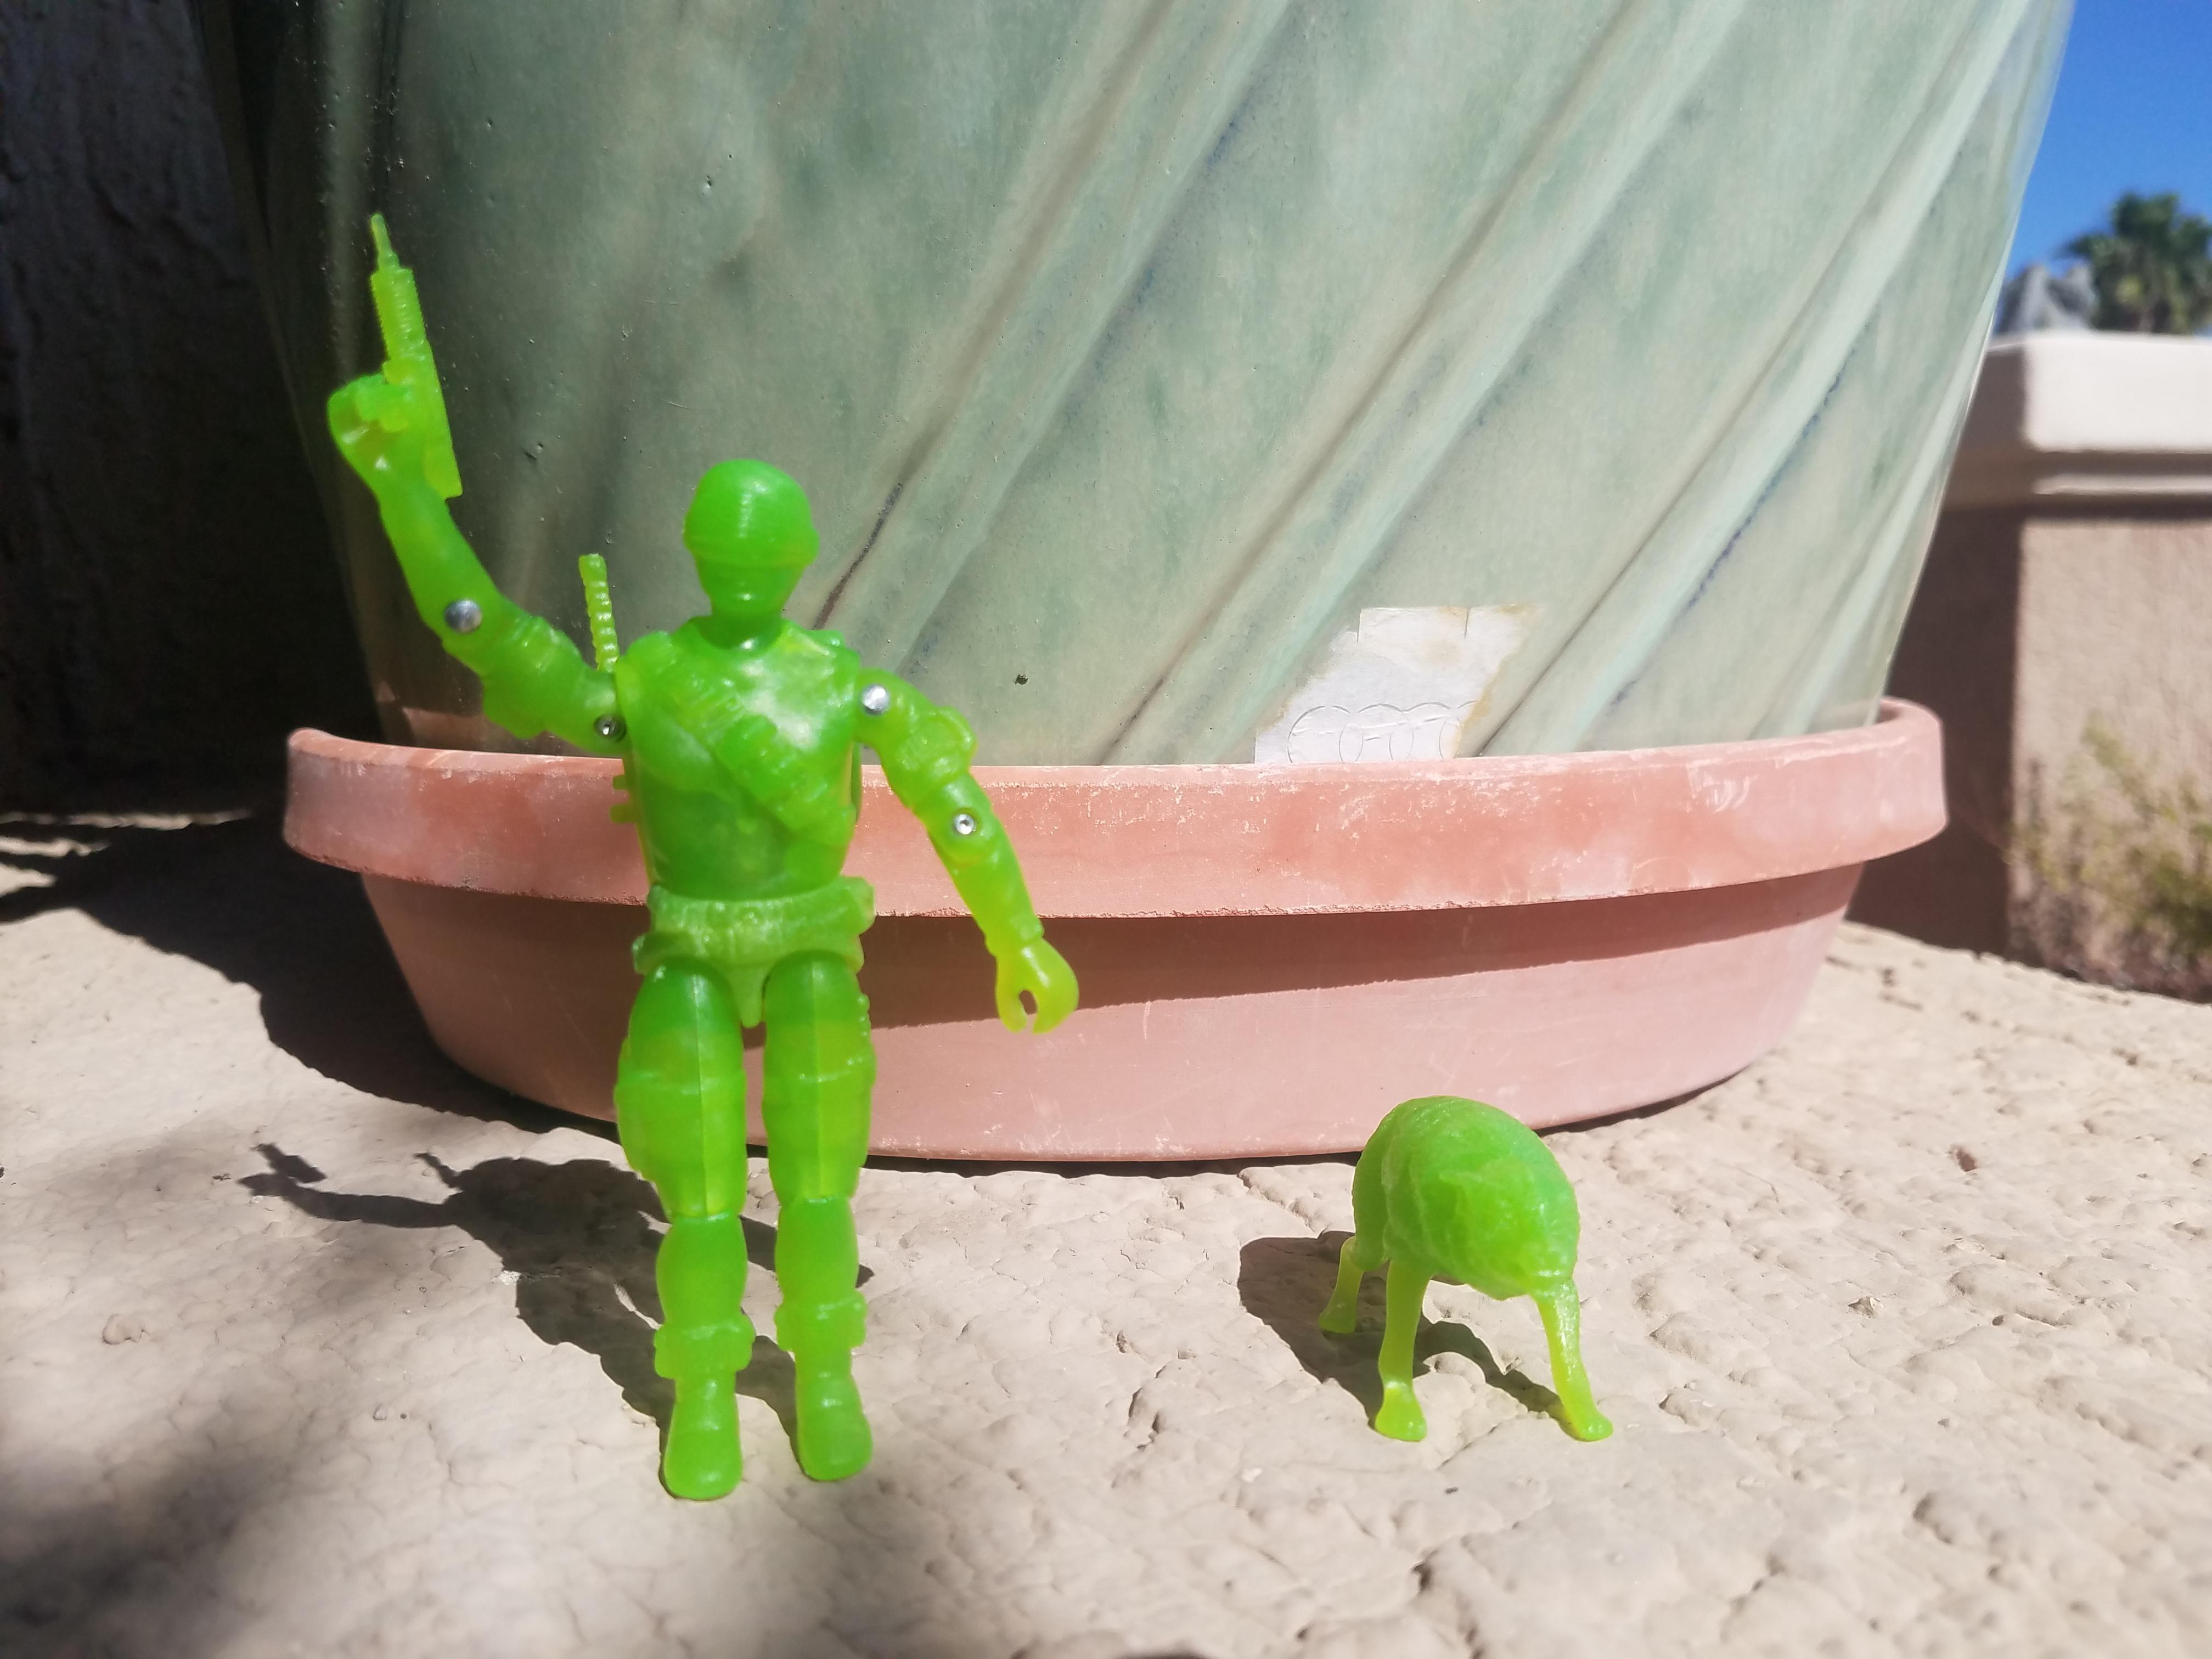 Gi Joe Black Major Snow Serpent Green Glow in the Dark Build it yourself